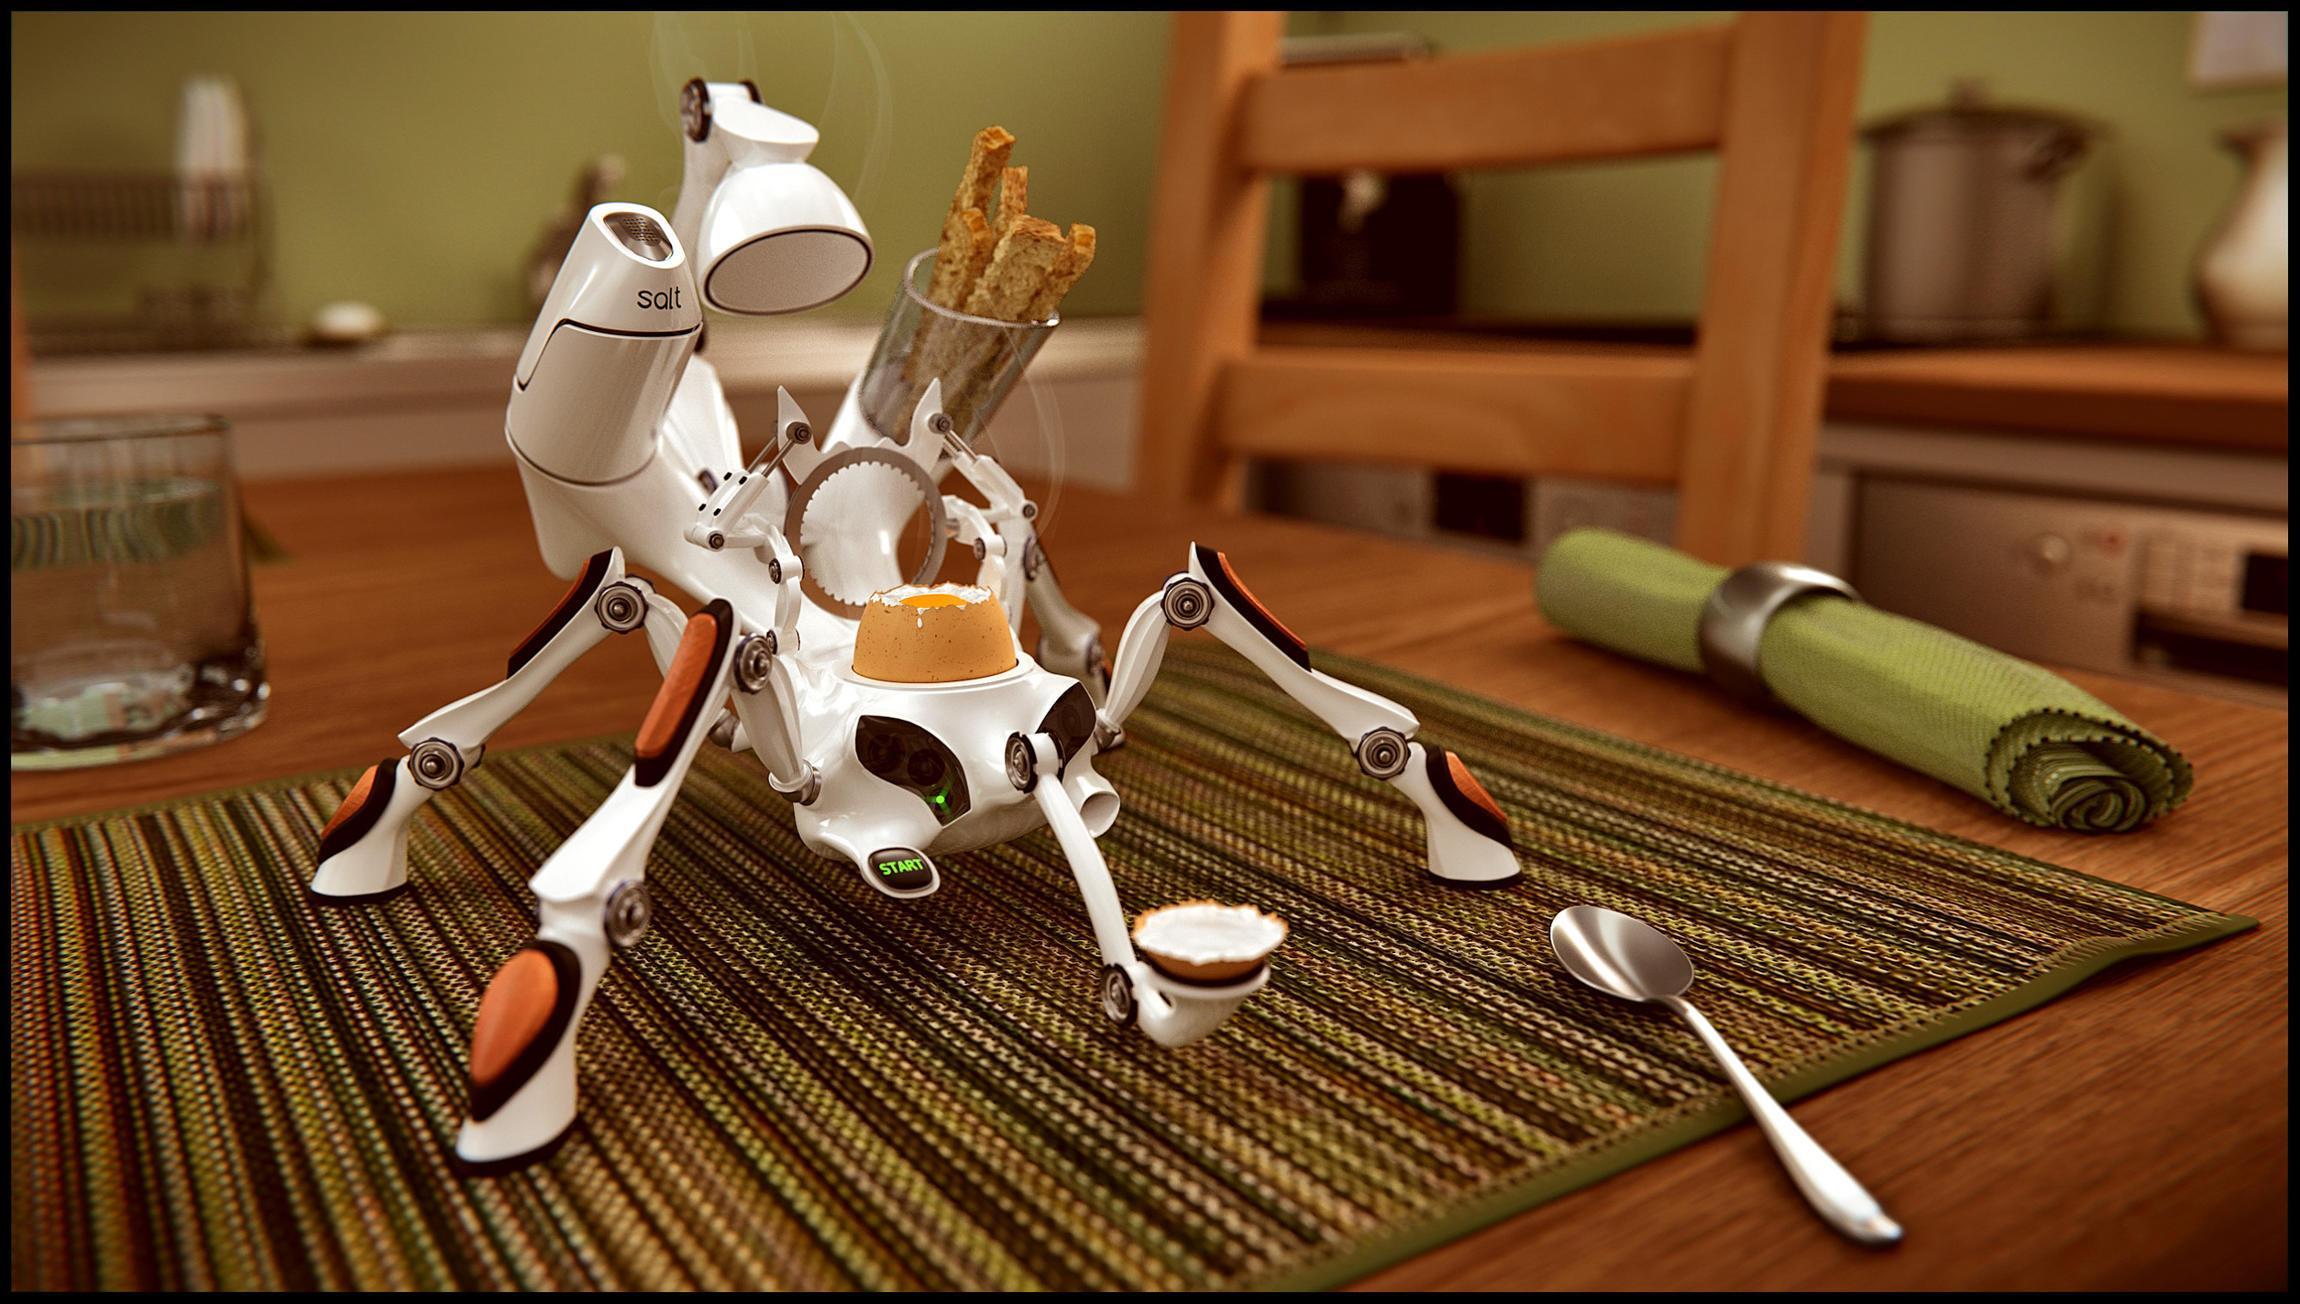 Eggcup robot